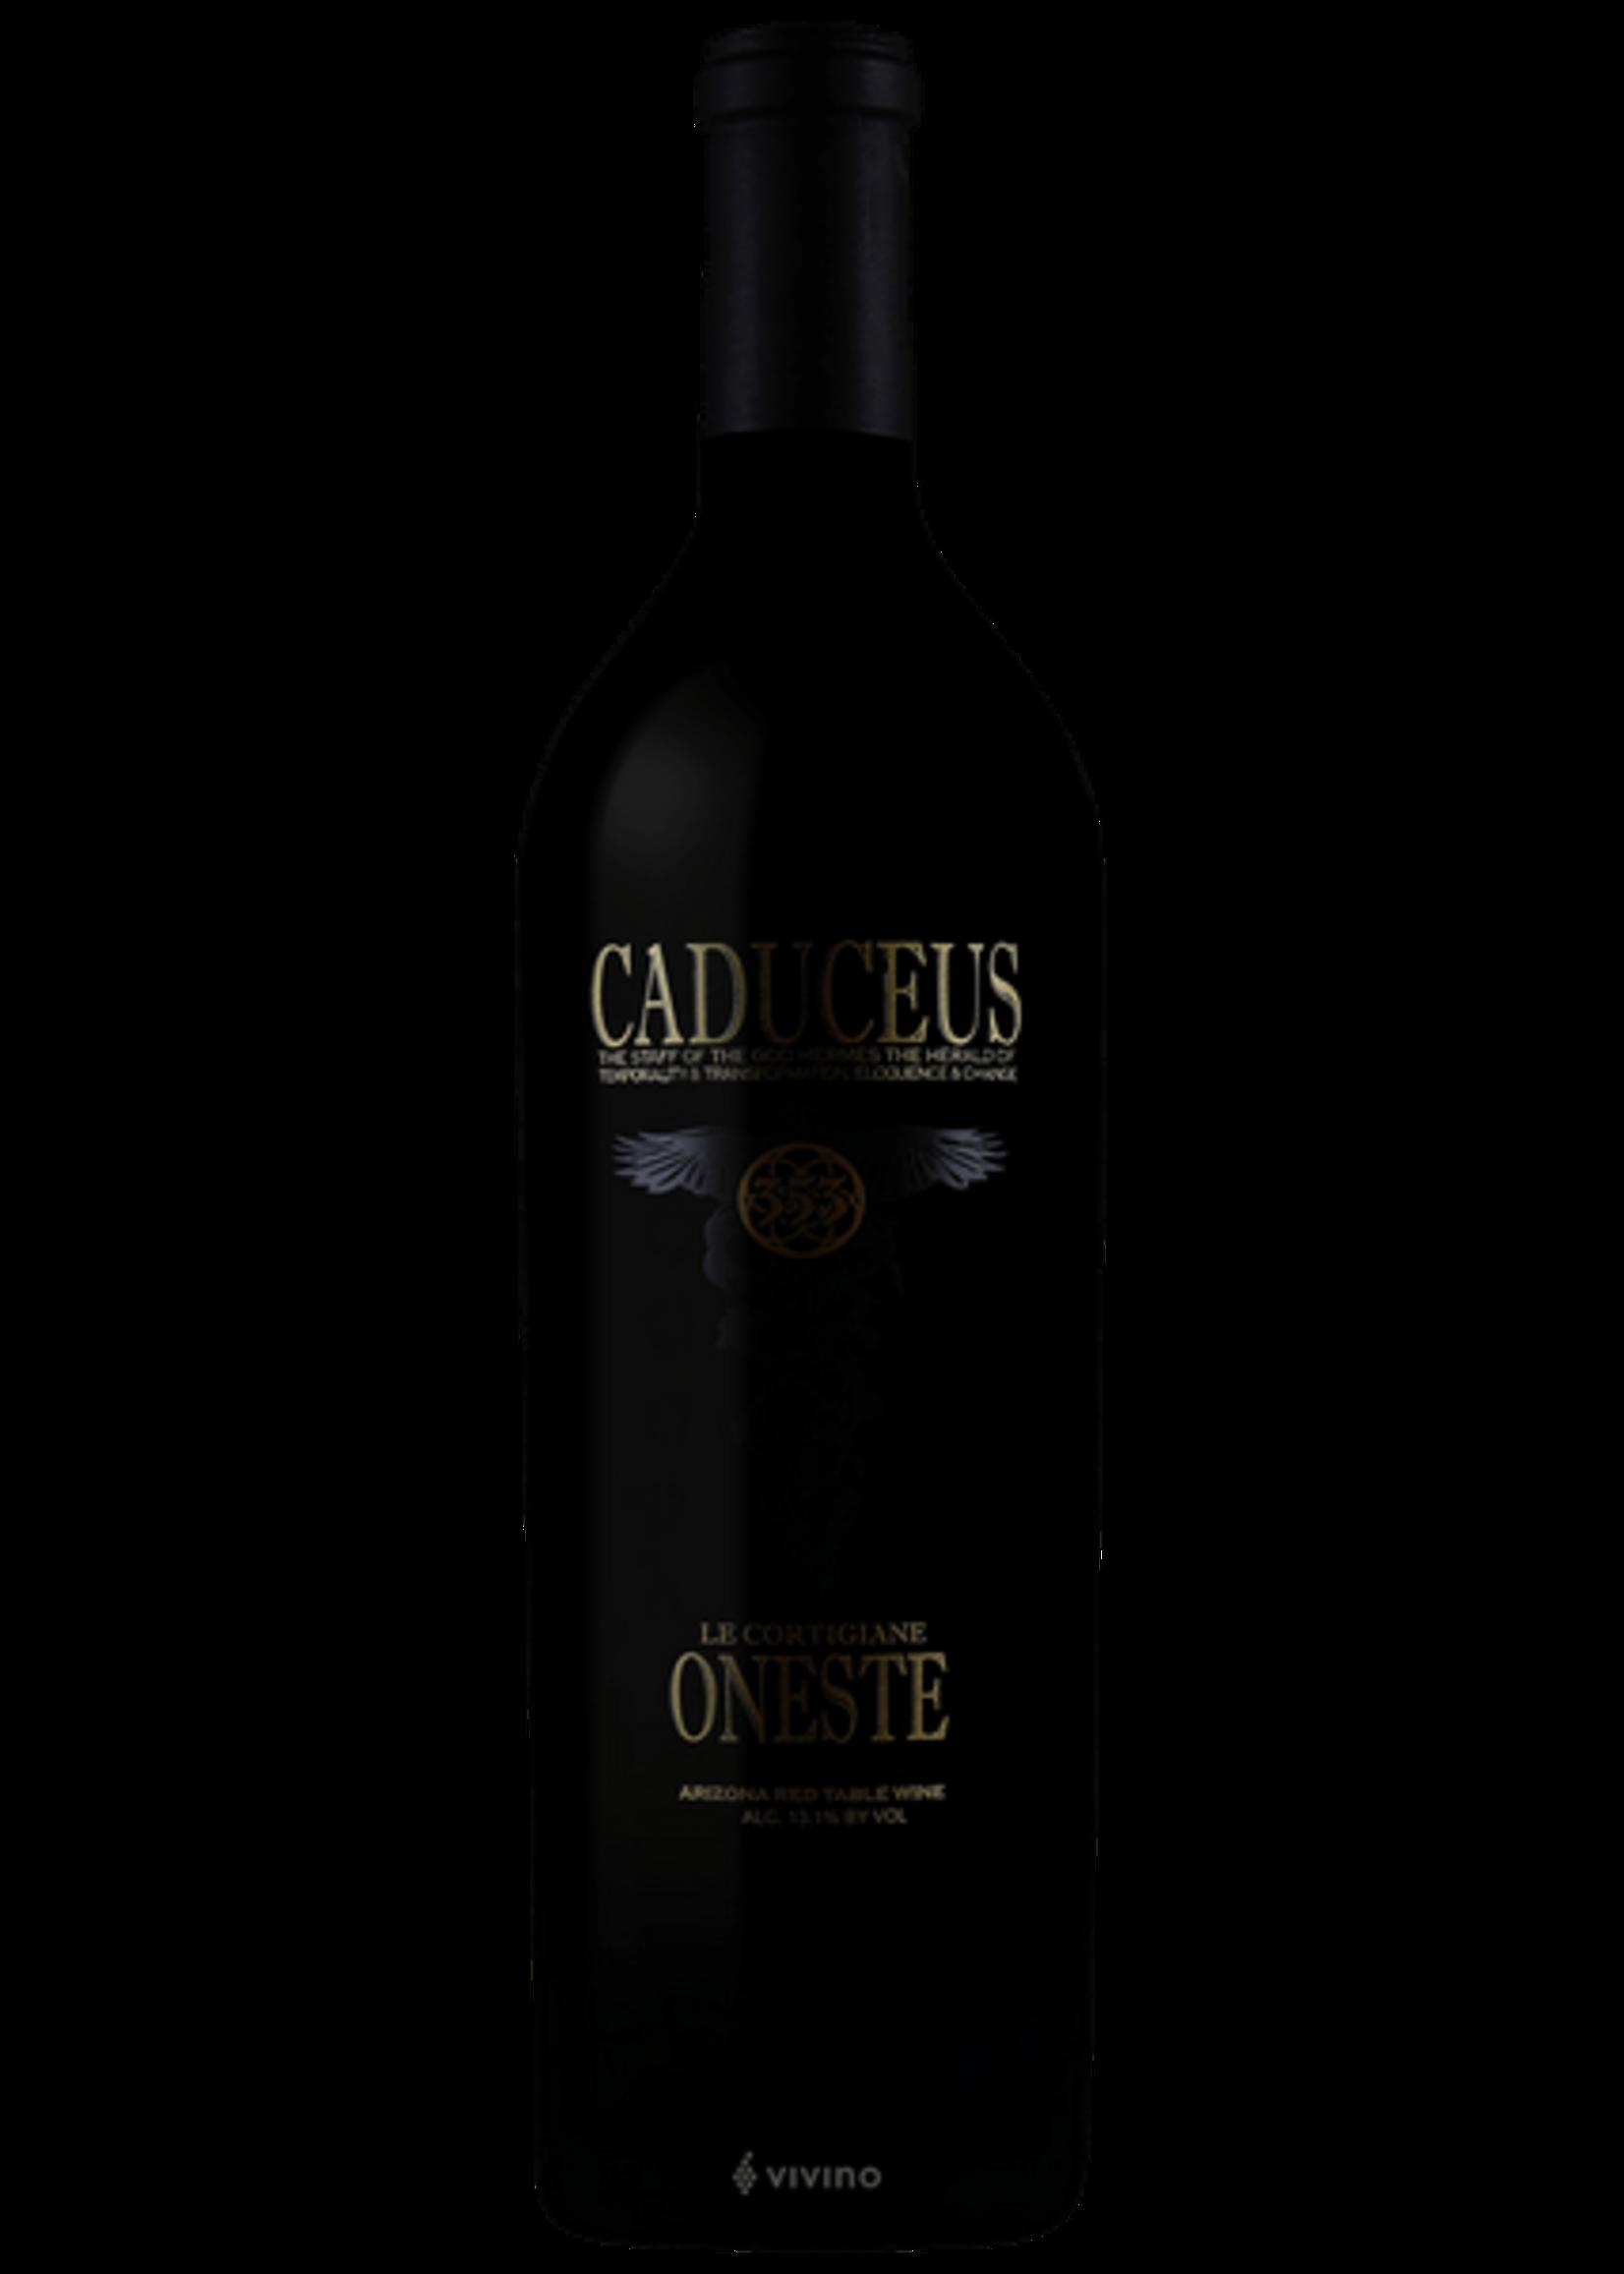 Caduceus Oneste Barbera/Merlot